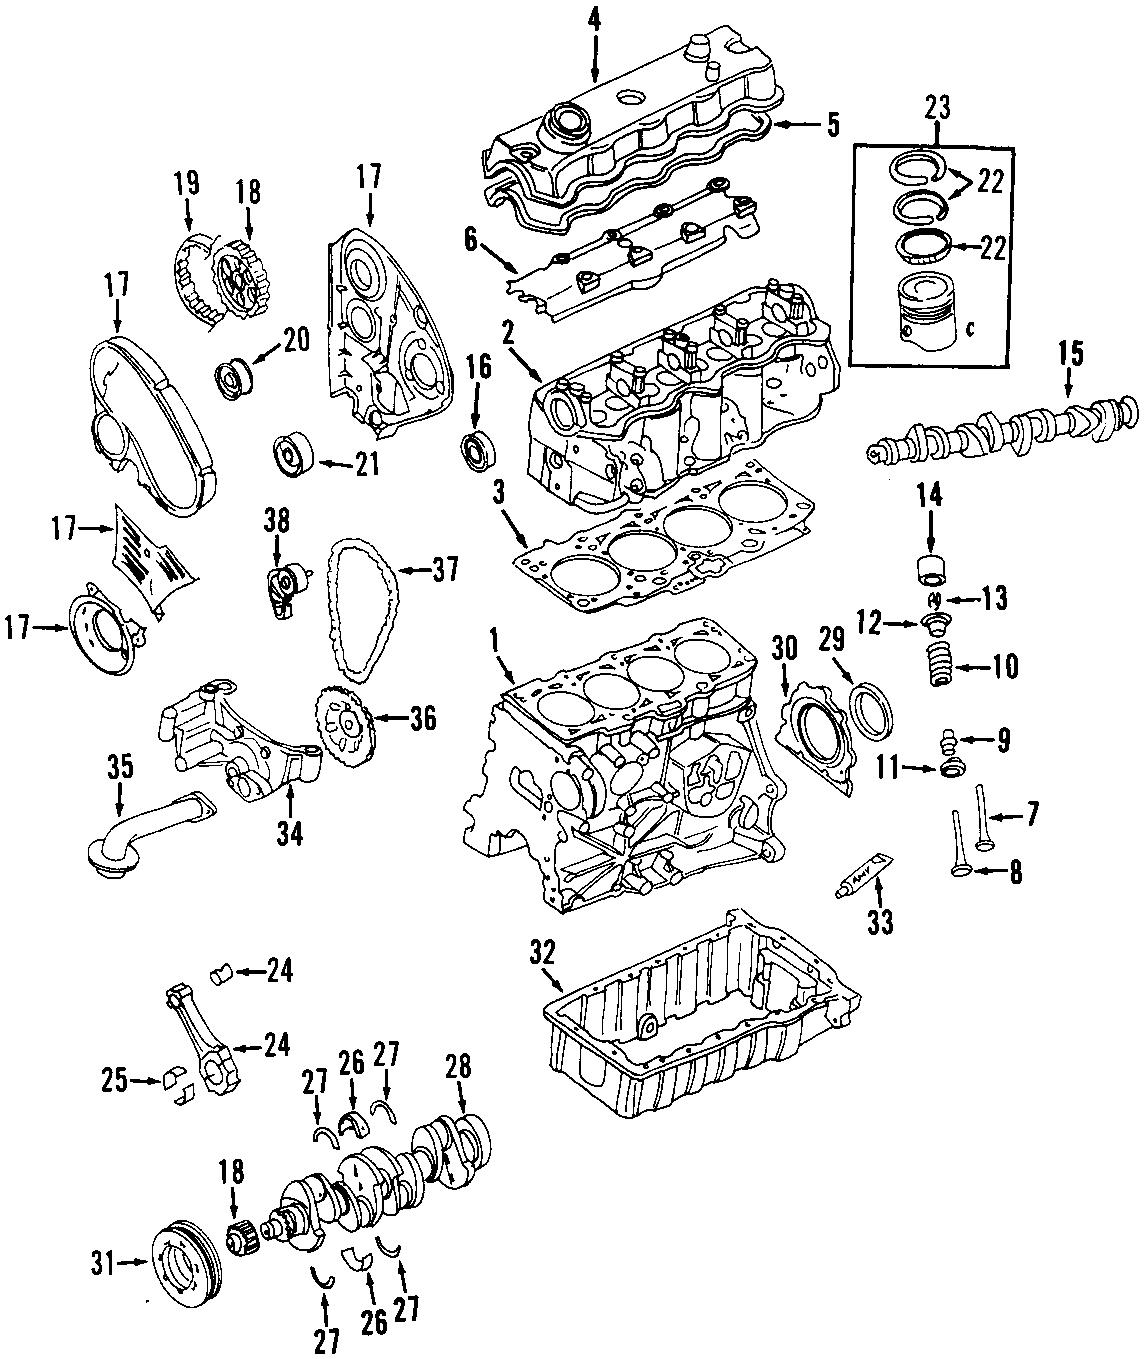 Volkswagen Beetle Convertible Engine Valve Spring Retainer